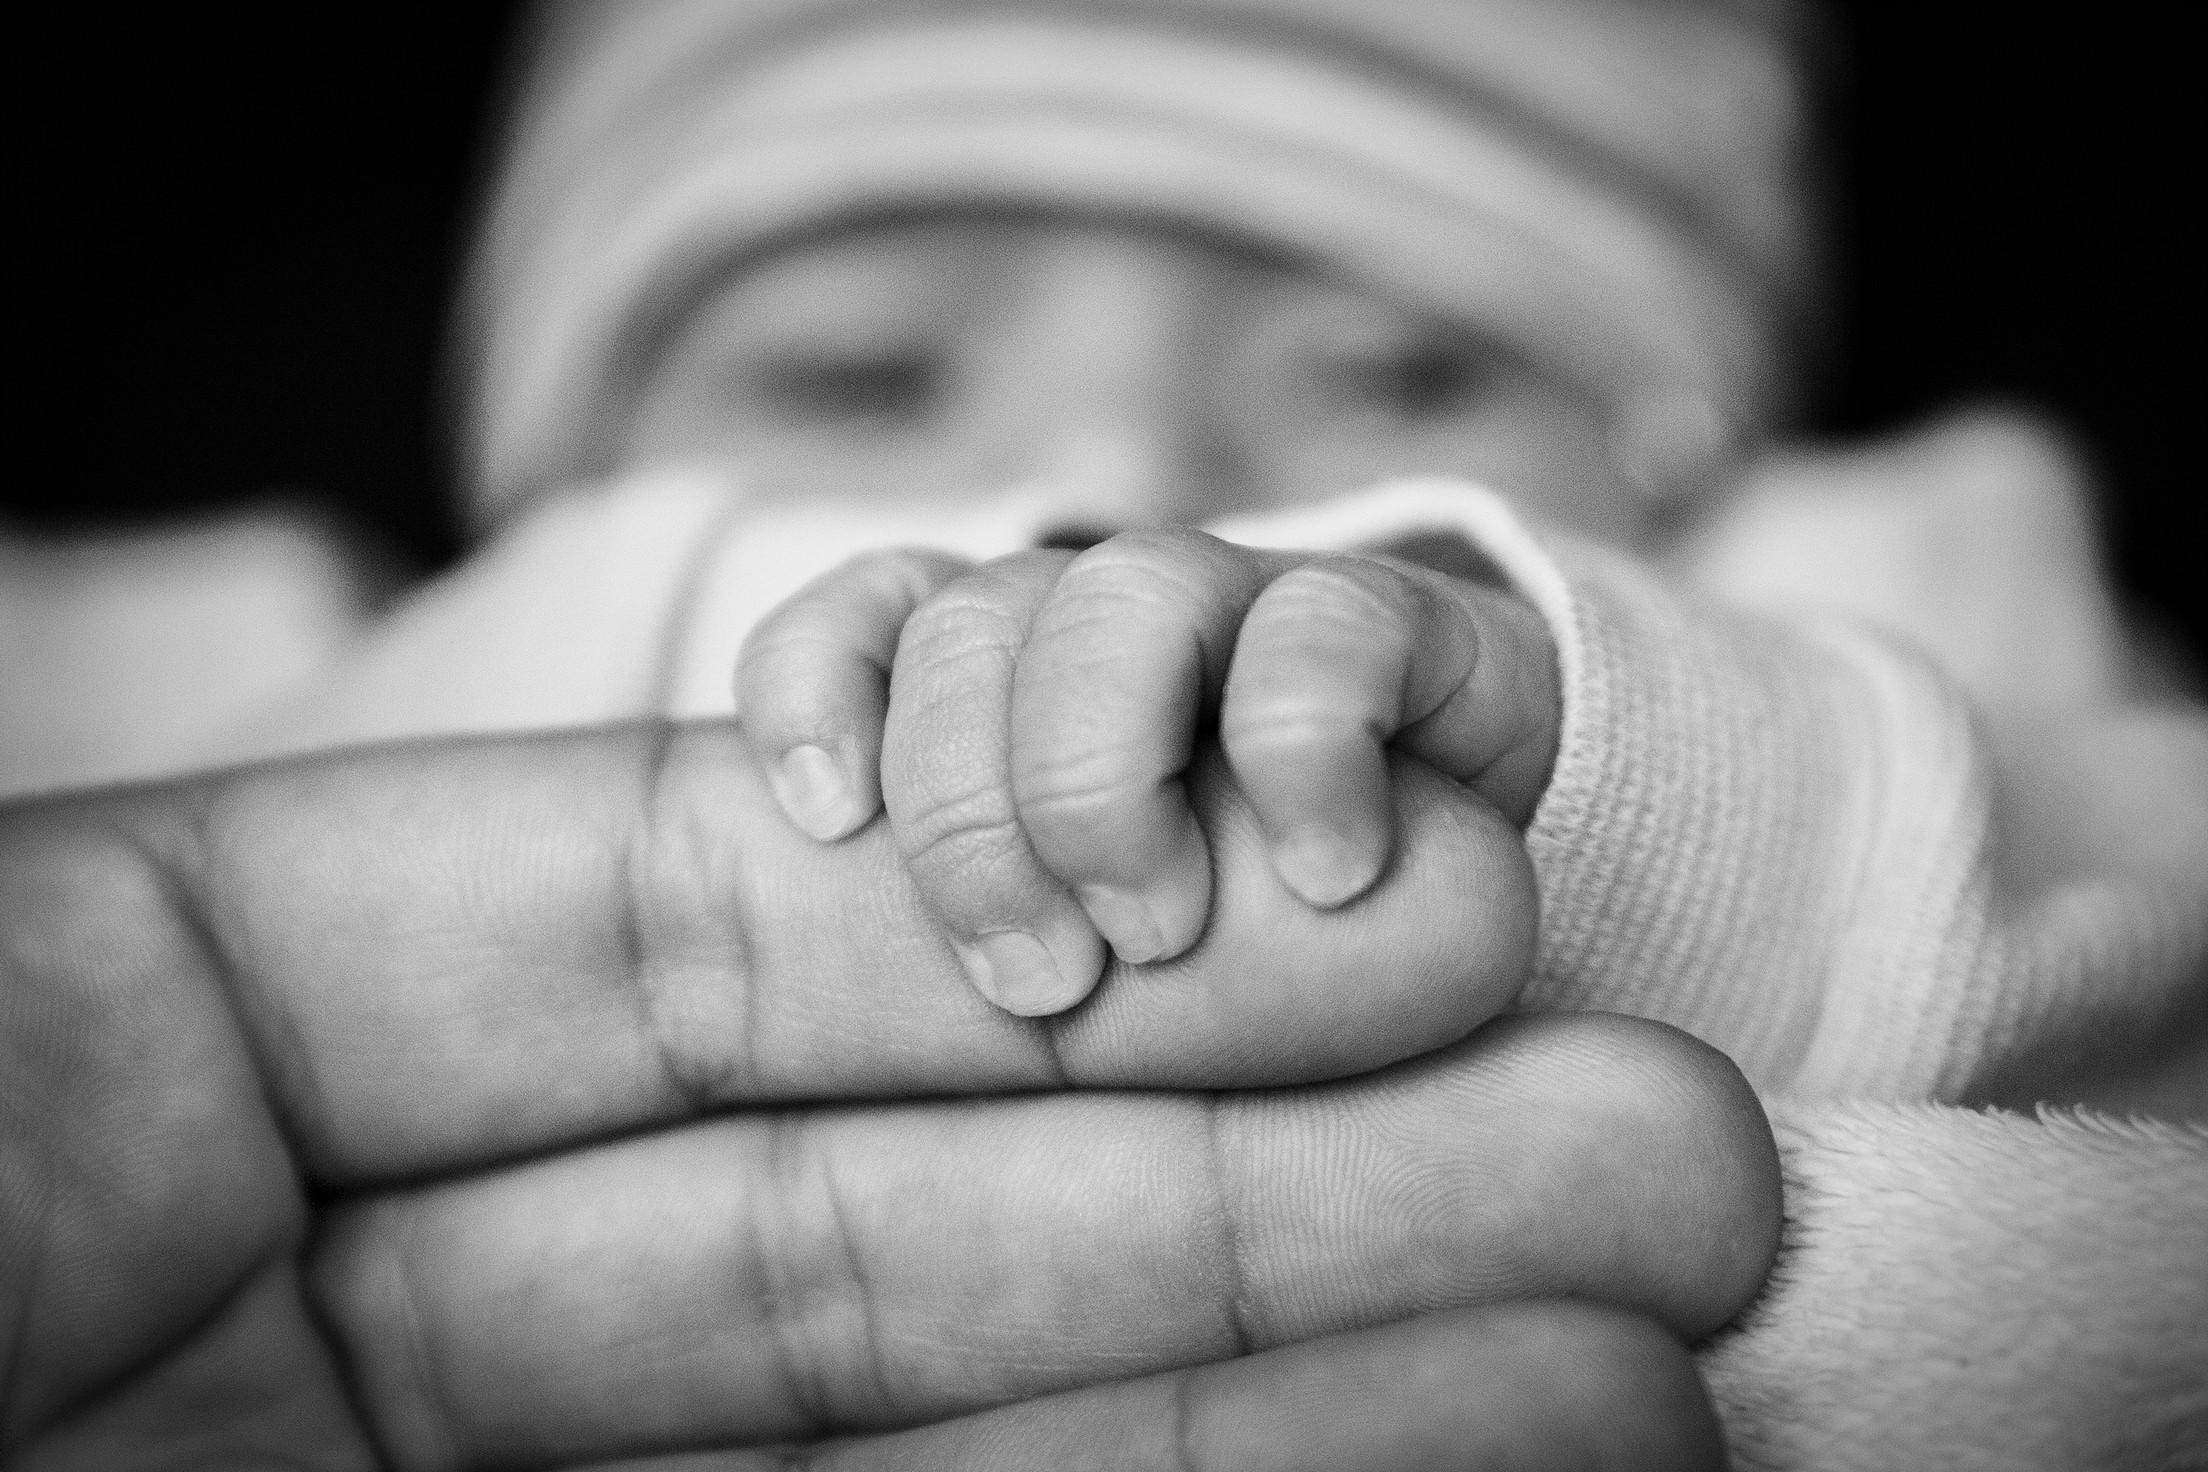 Infant holding man's hand